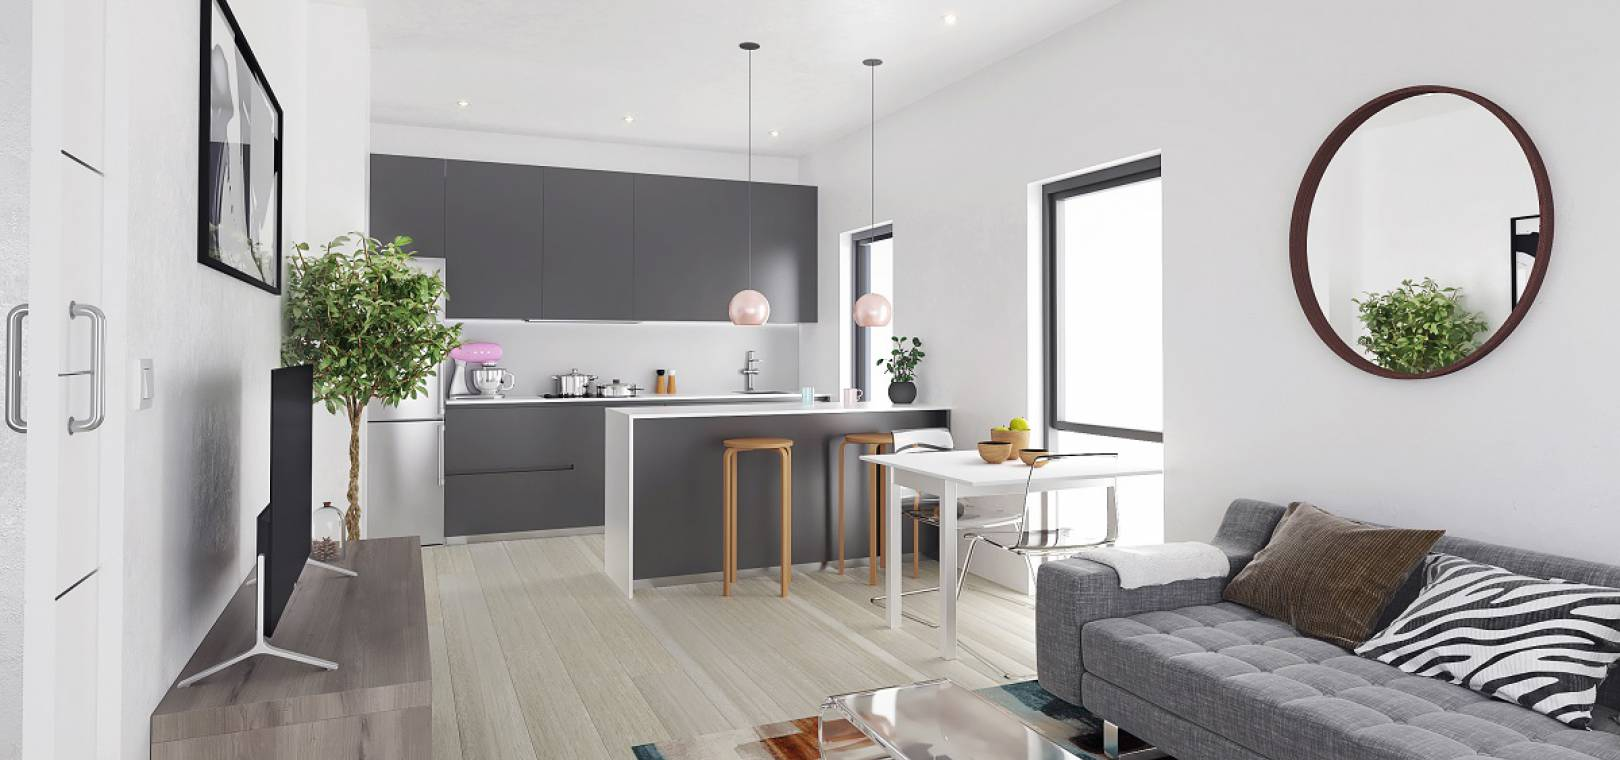 Palapa_Golf_Villamartin_New_Build_Properties_For_Sale_11